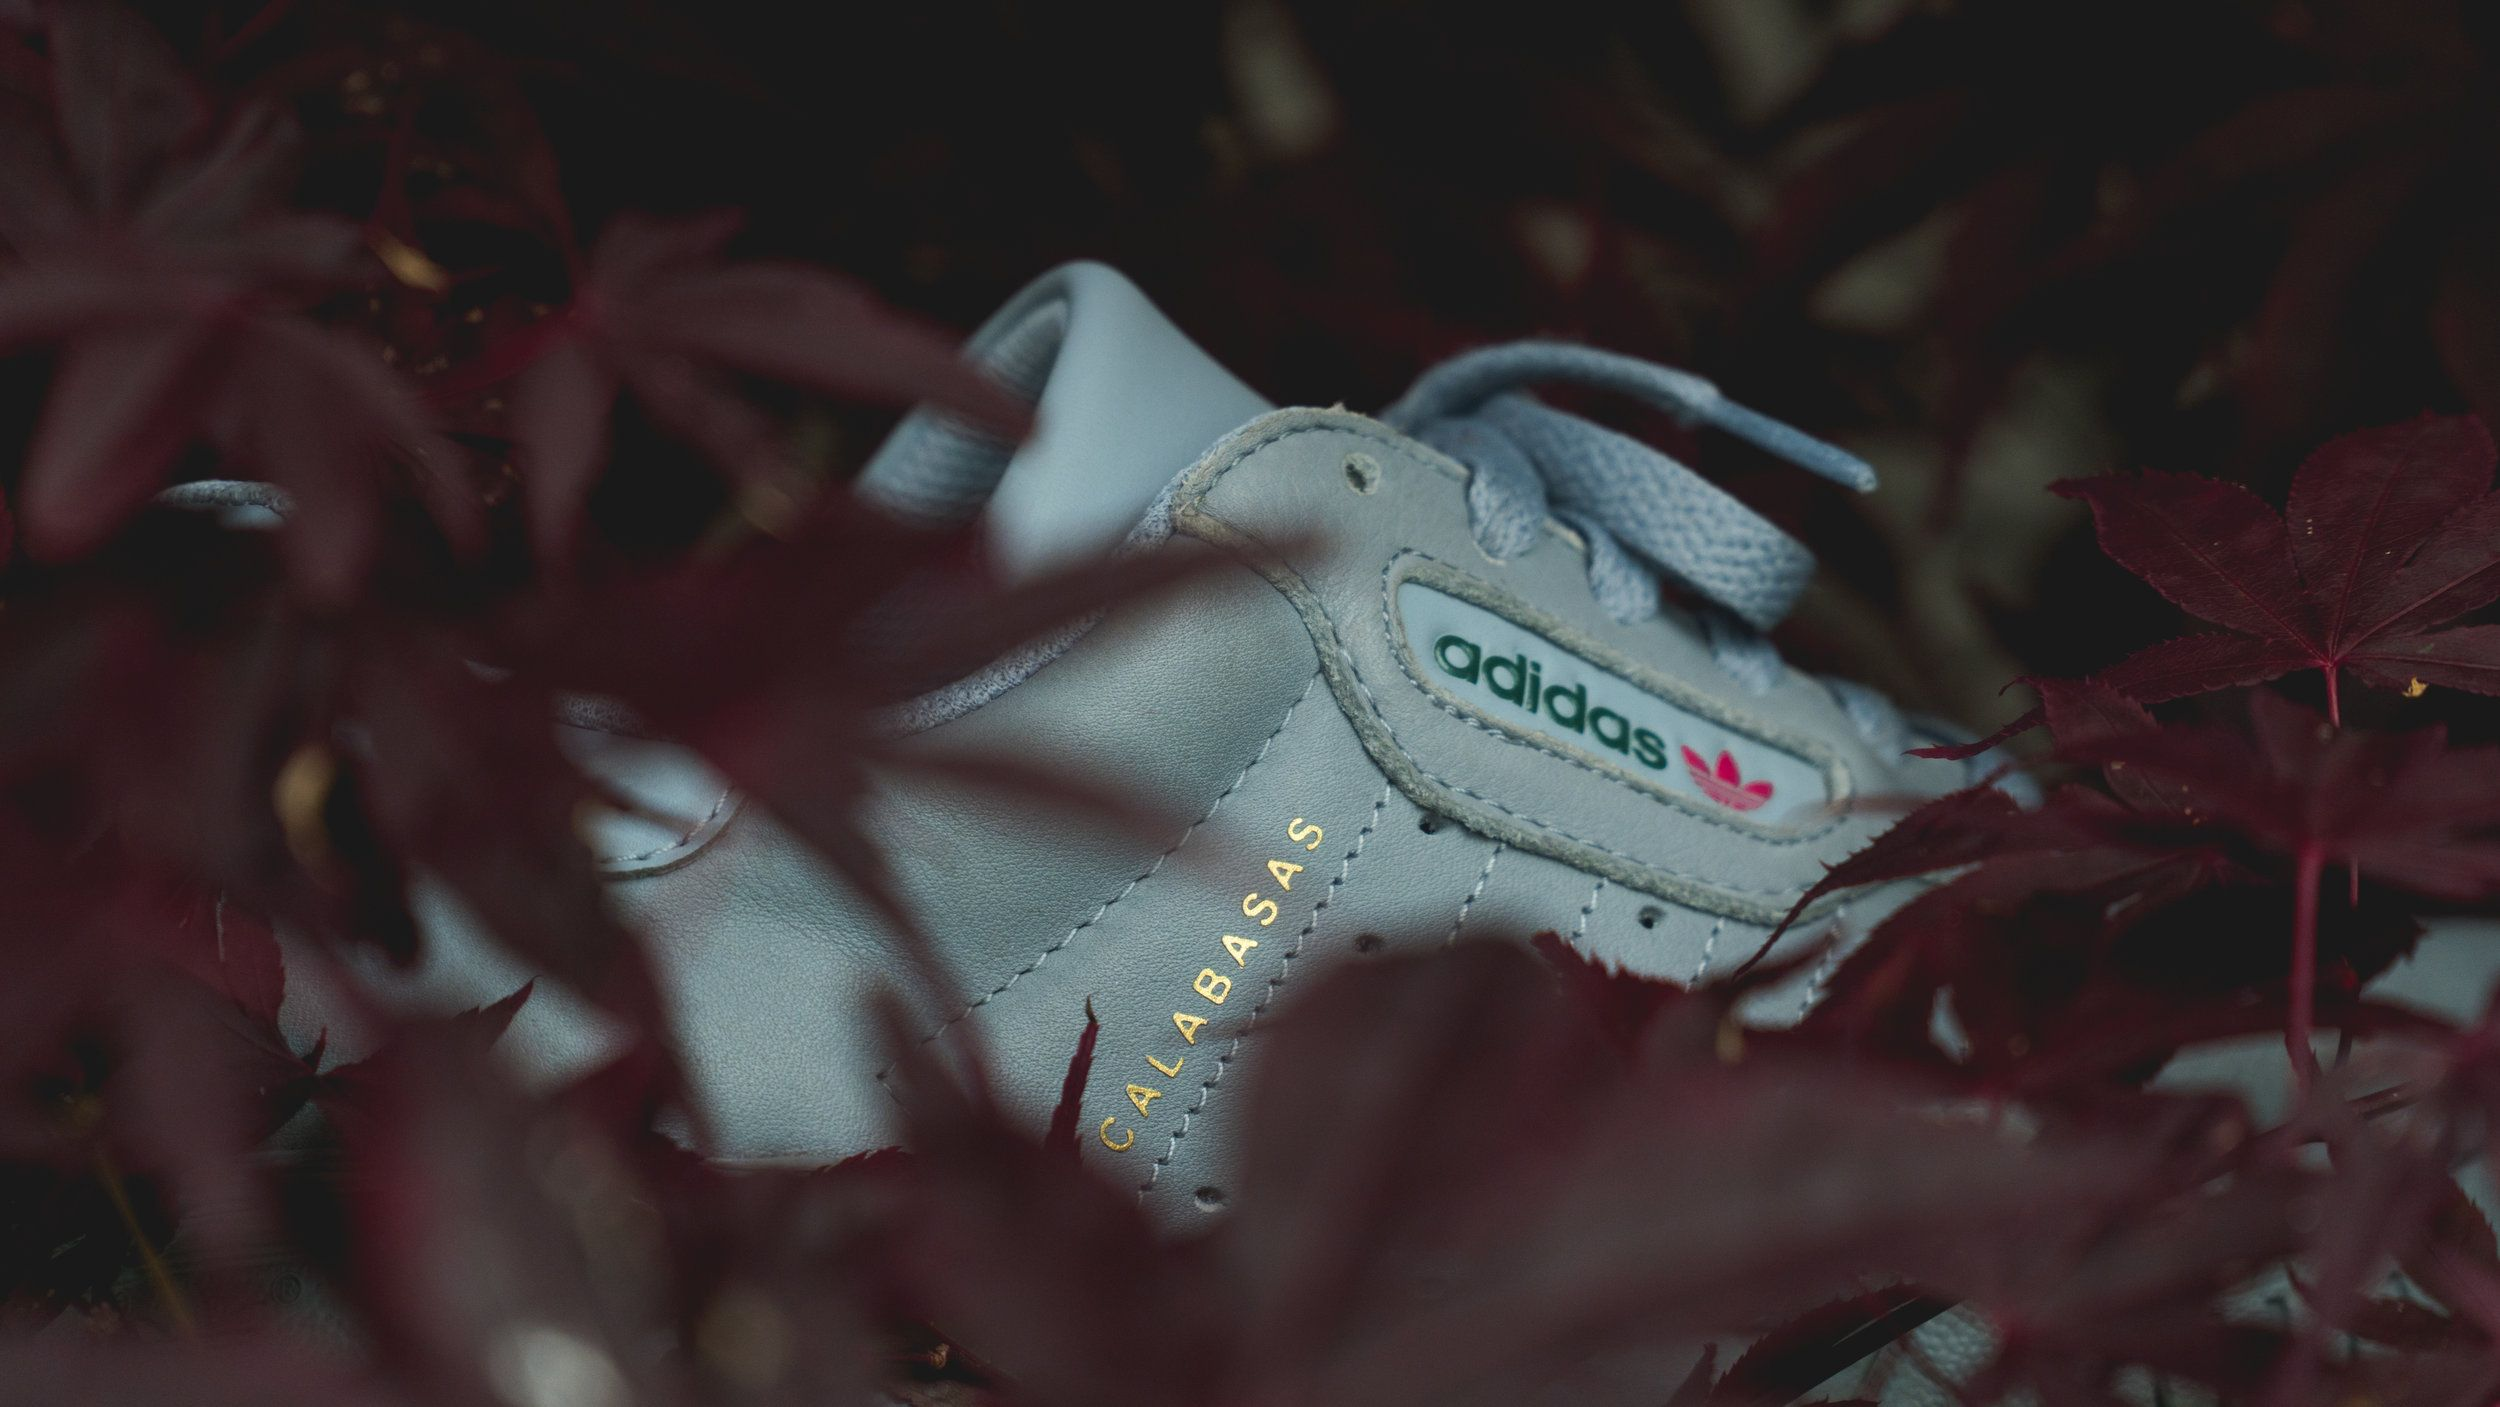 online retailer 79b40 16e17 Adidas Yeezy Season 5 Calabasas — Matt Wild Media